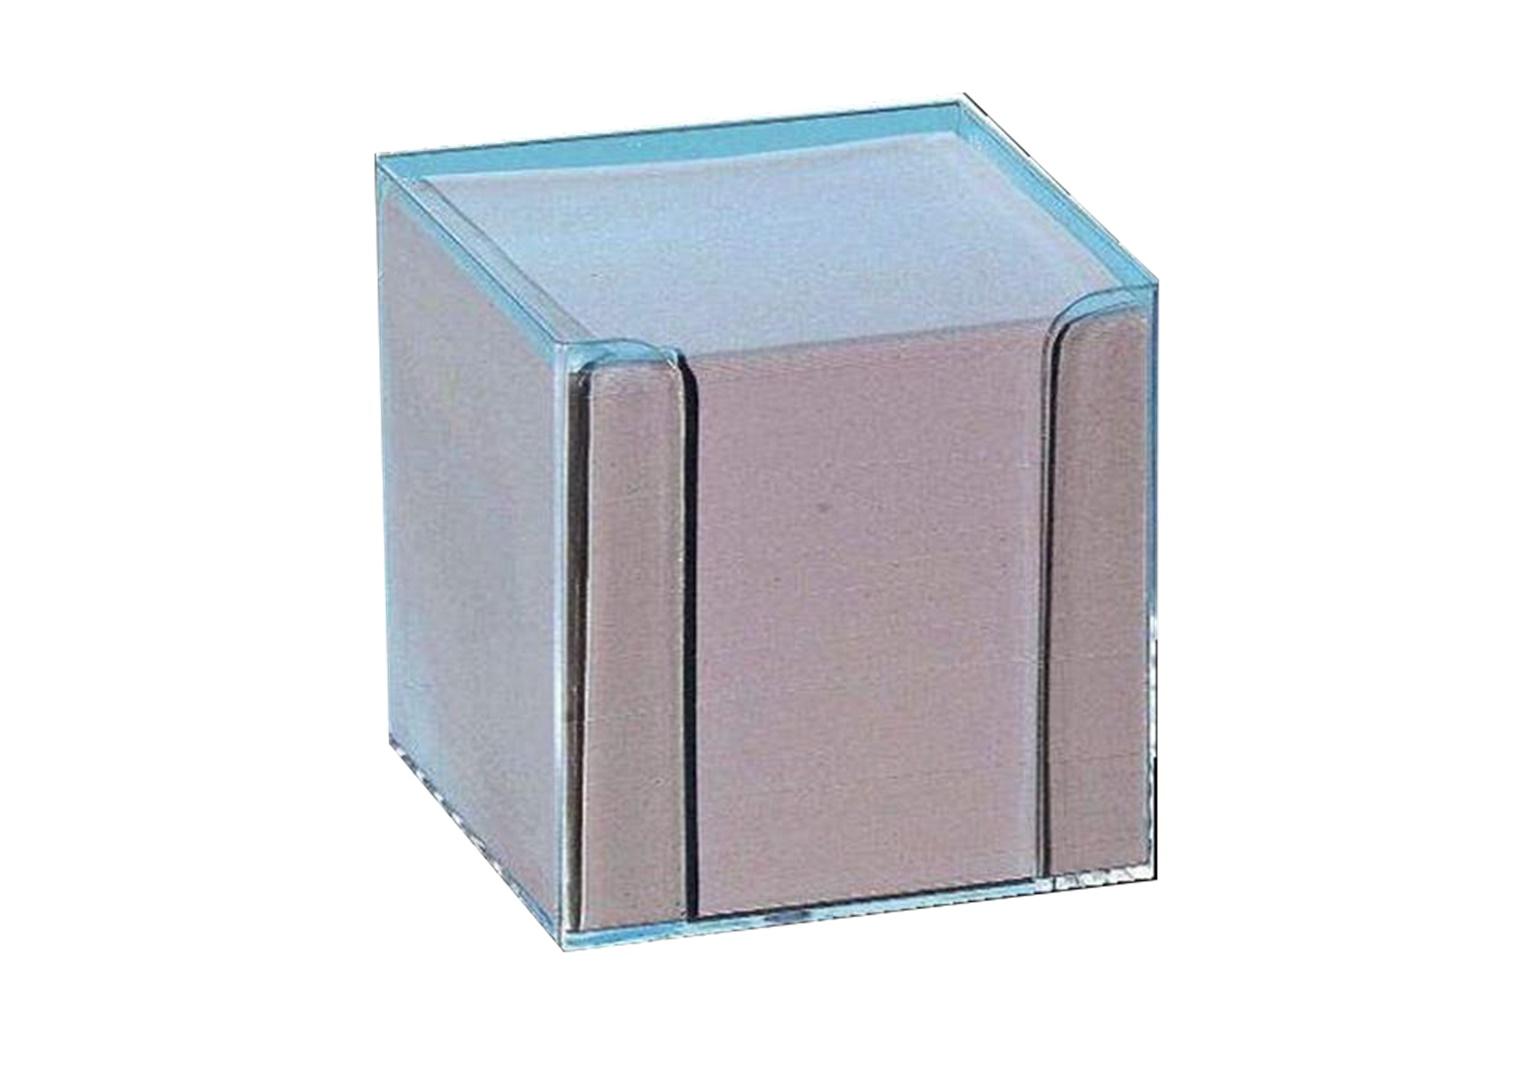 Folia Notizboxen Glasklar Weiß Büroaccessoires Büro Schule